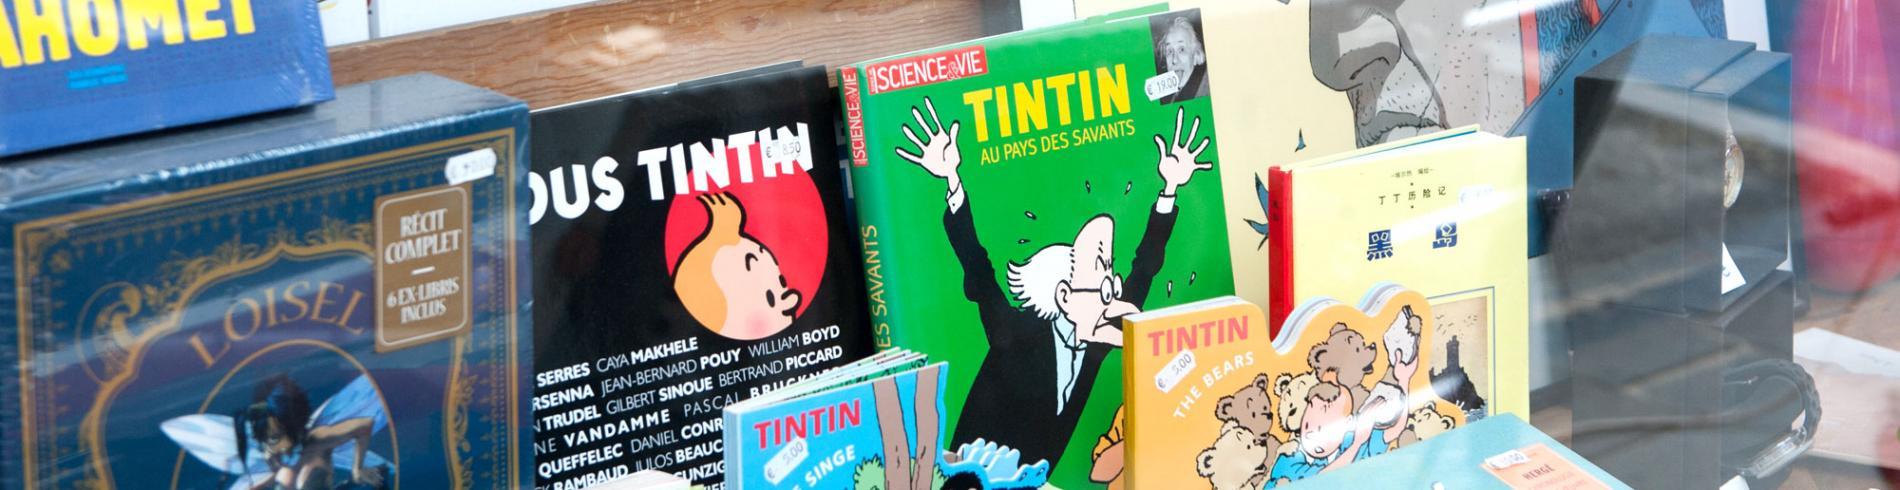 Tintin books in the window of a bookshop